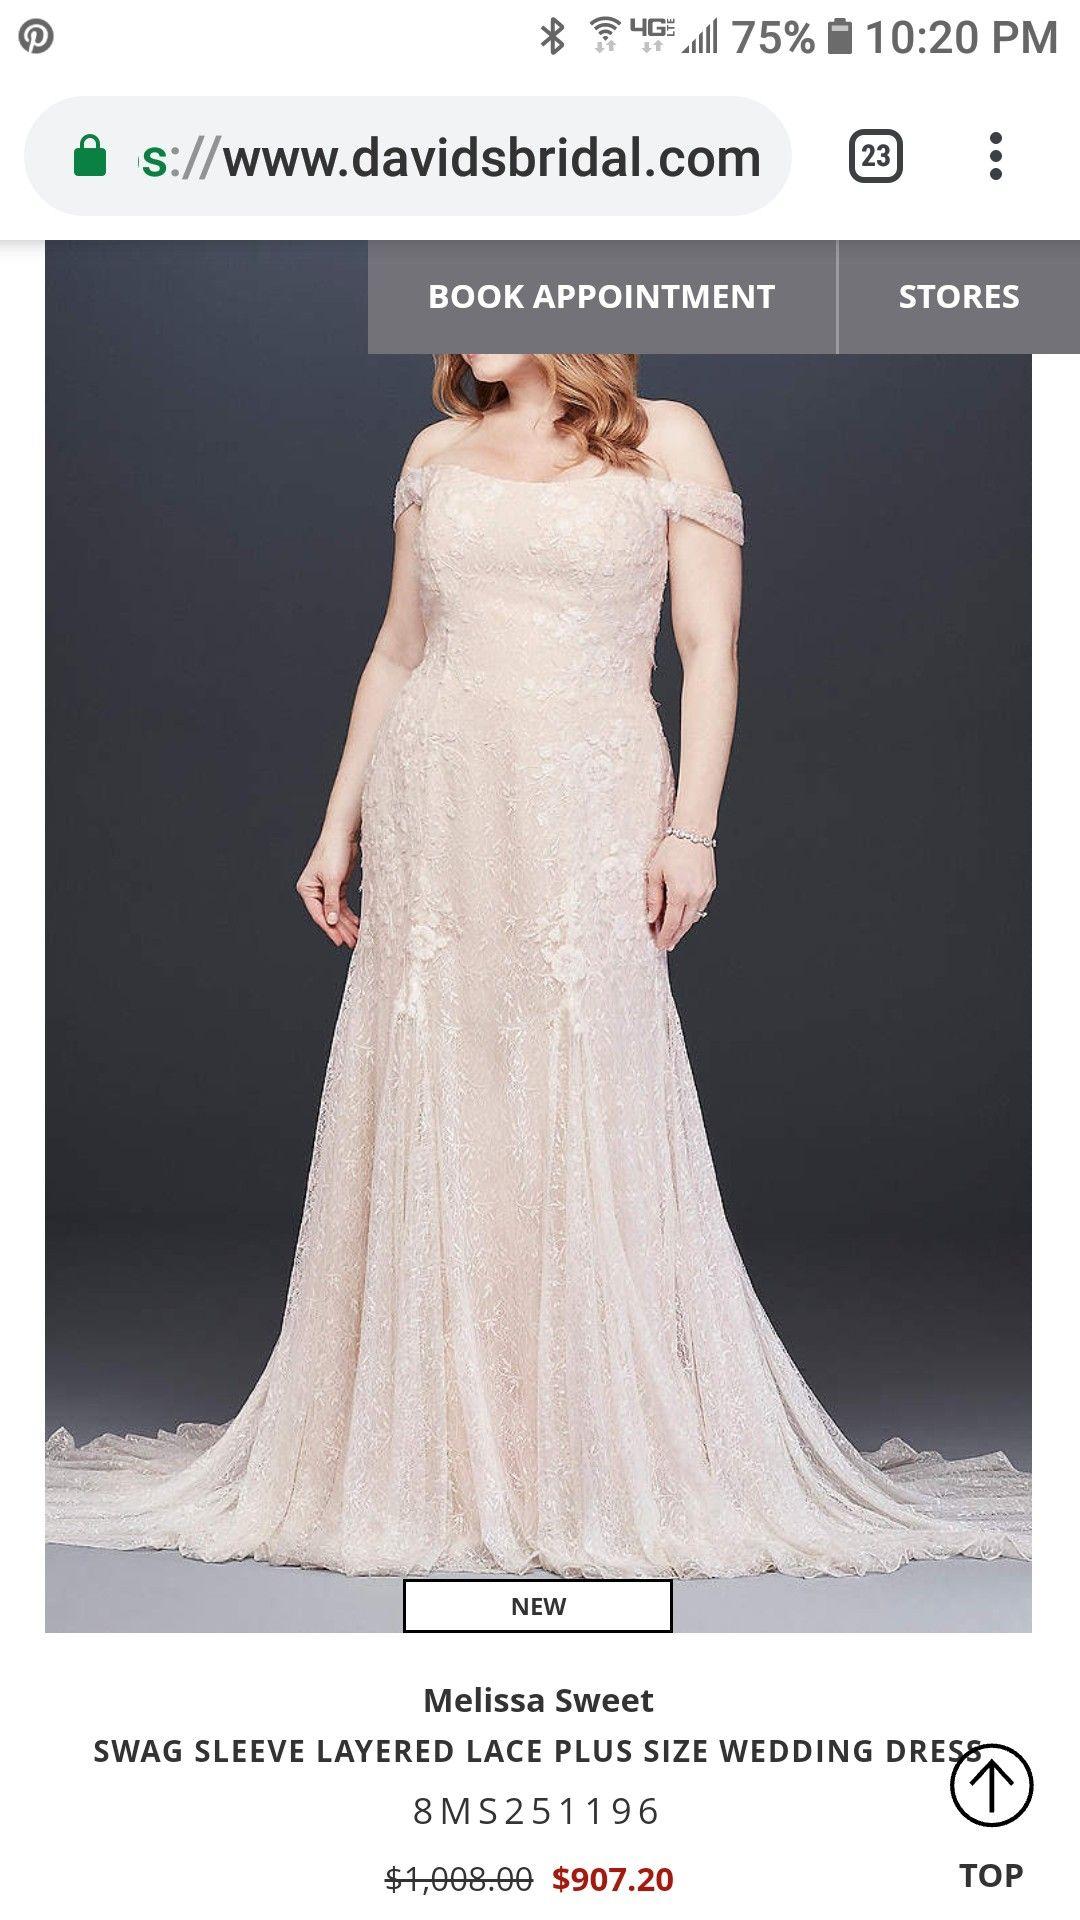 Pin By Hannah Cooke On Cincocincocinco Wedding Dresses Dresses Plus Size Wedding [ 1920 x 1080 Pixel ]